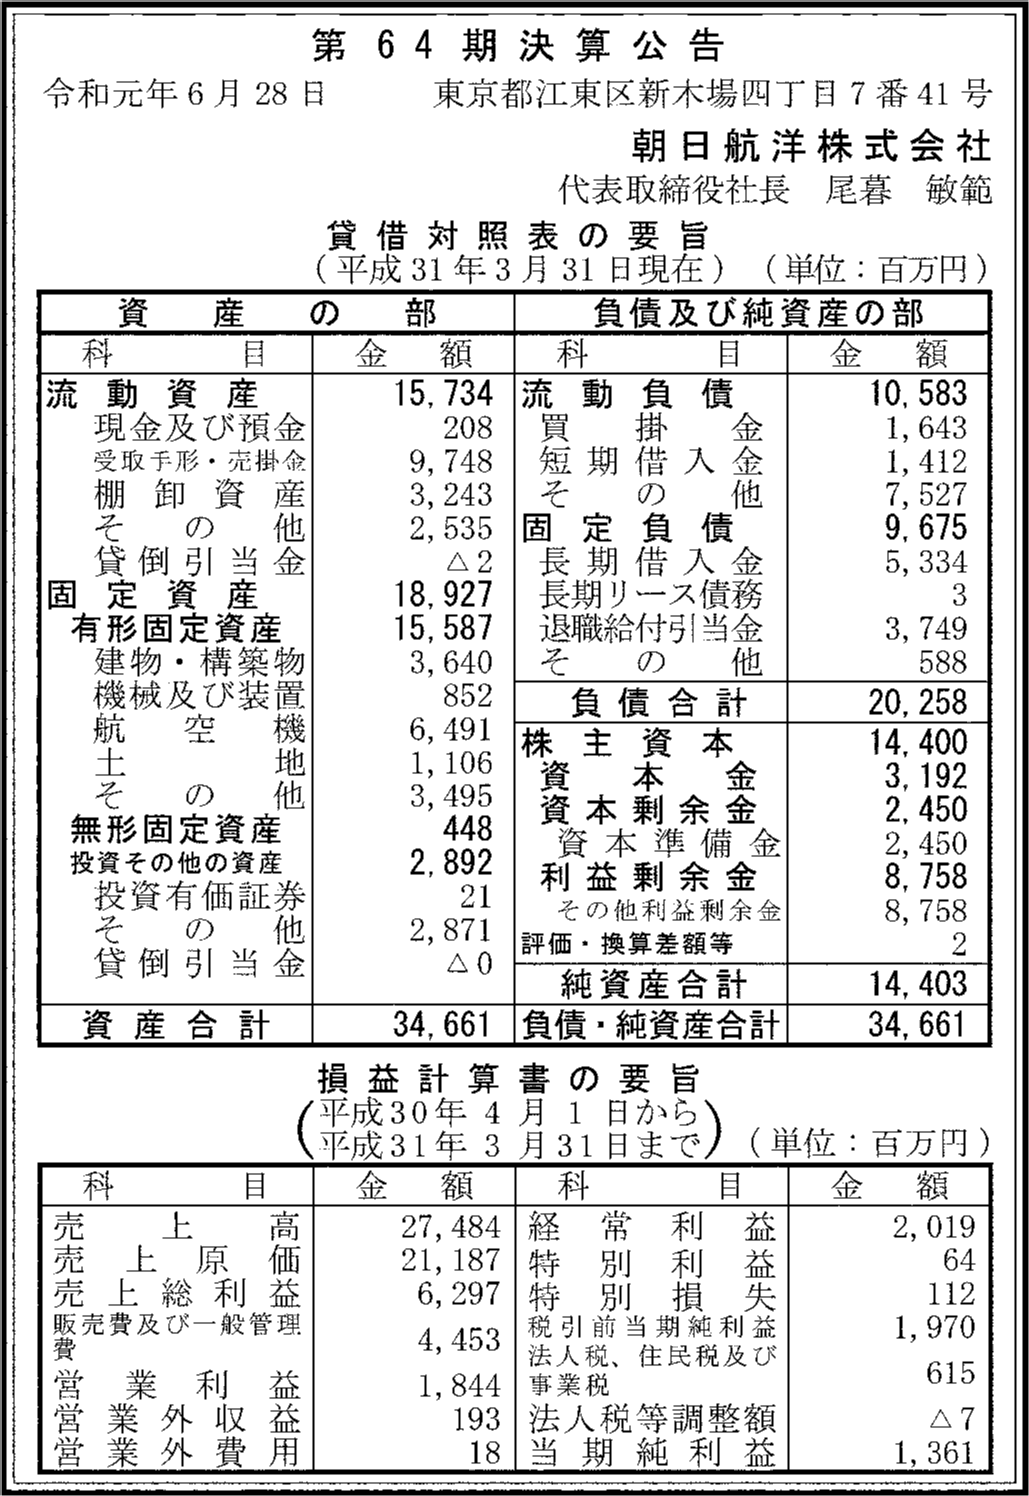 0277 ffdcd964cf54b754d48190f46d431fdf1168f26edd6ece755f2d8eb1c134bcf57d5e81f4c163ab6c88186a3d48796561b2590b296dd3021ab9baeb4c75d15f86 03